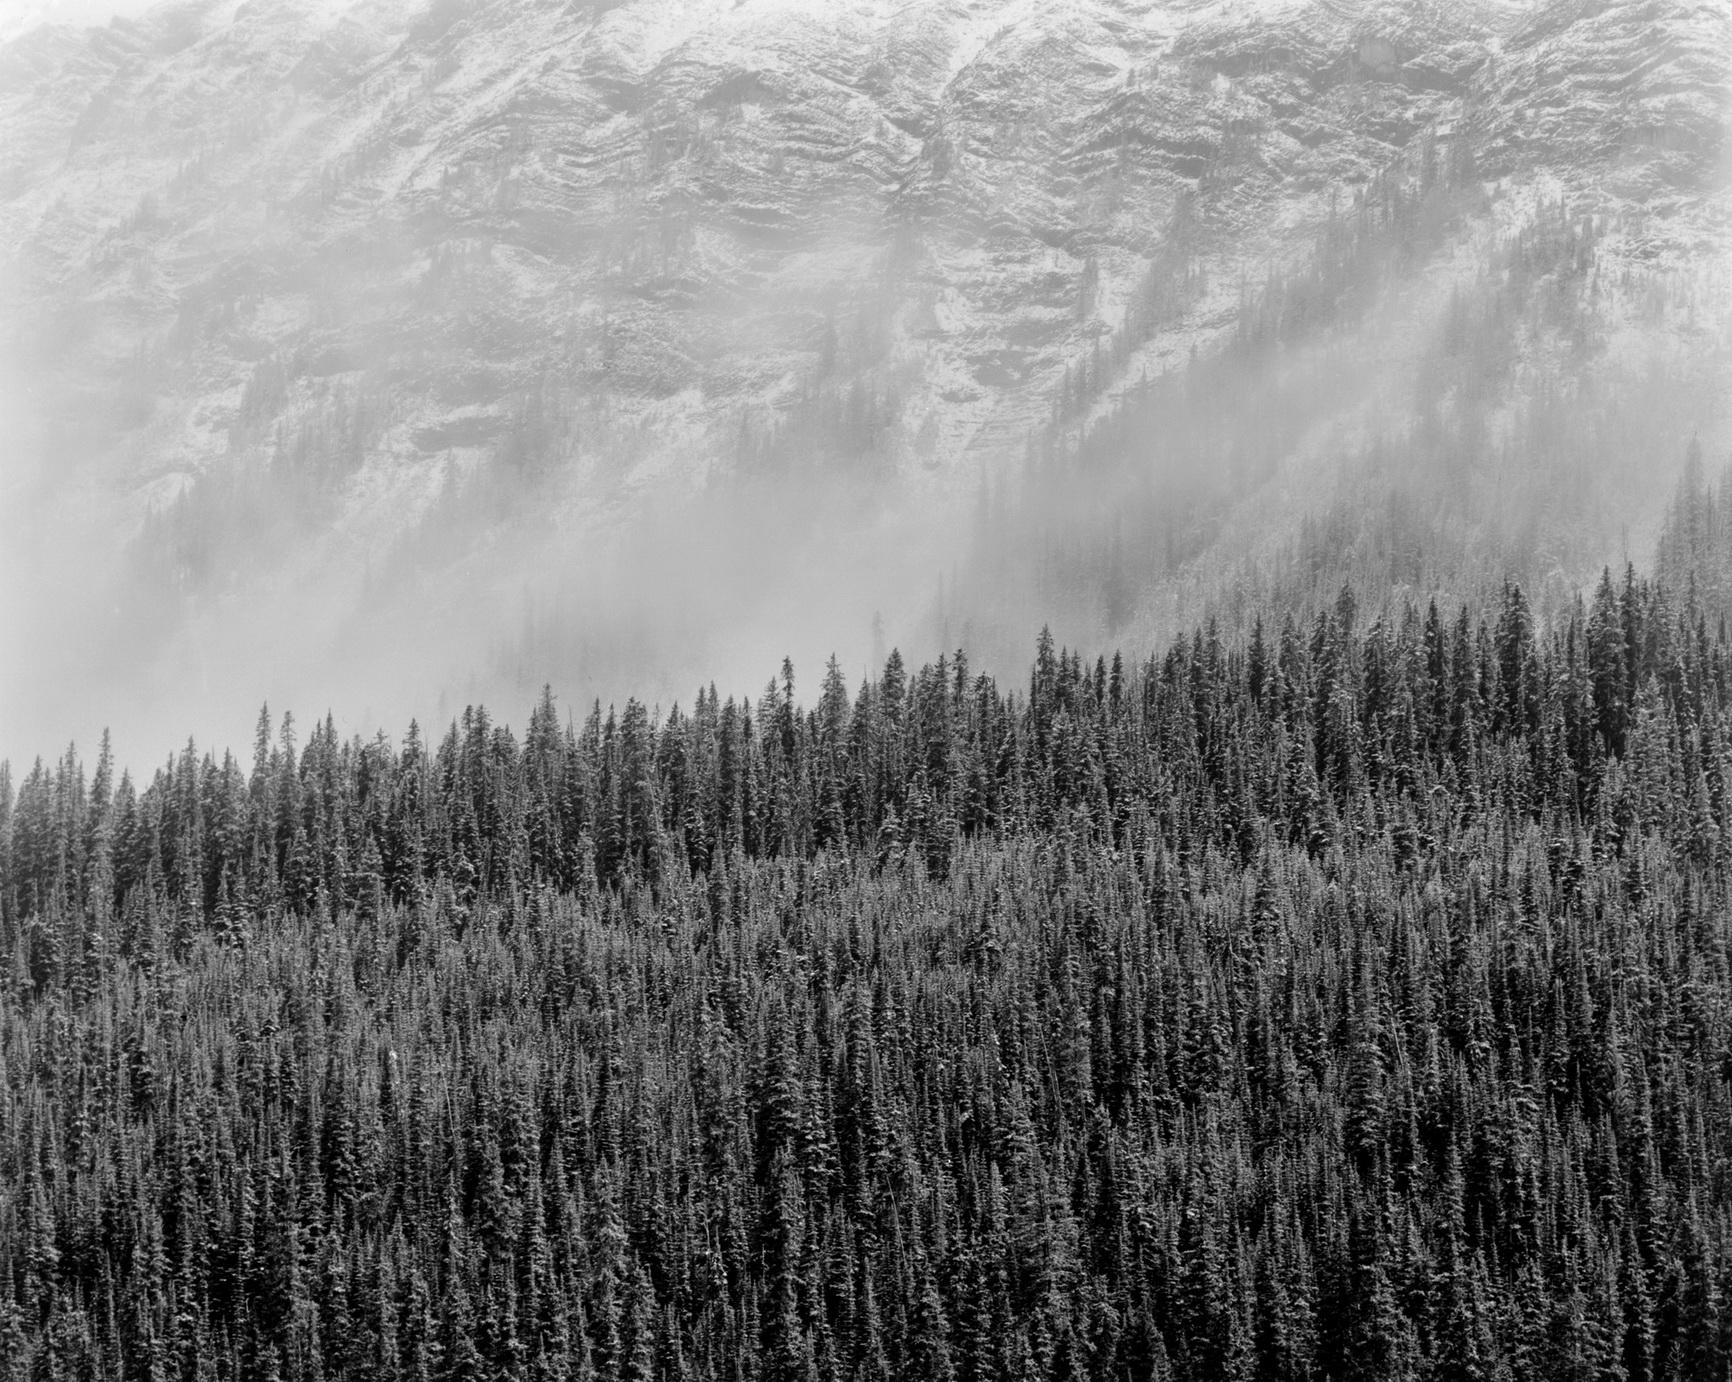 152002- Rockies